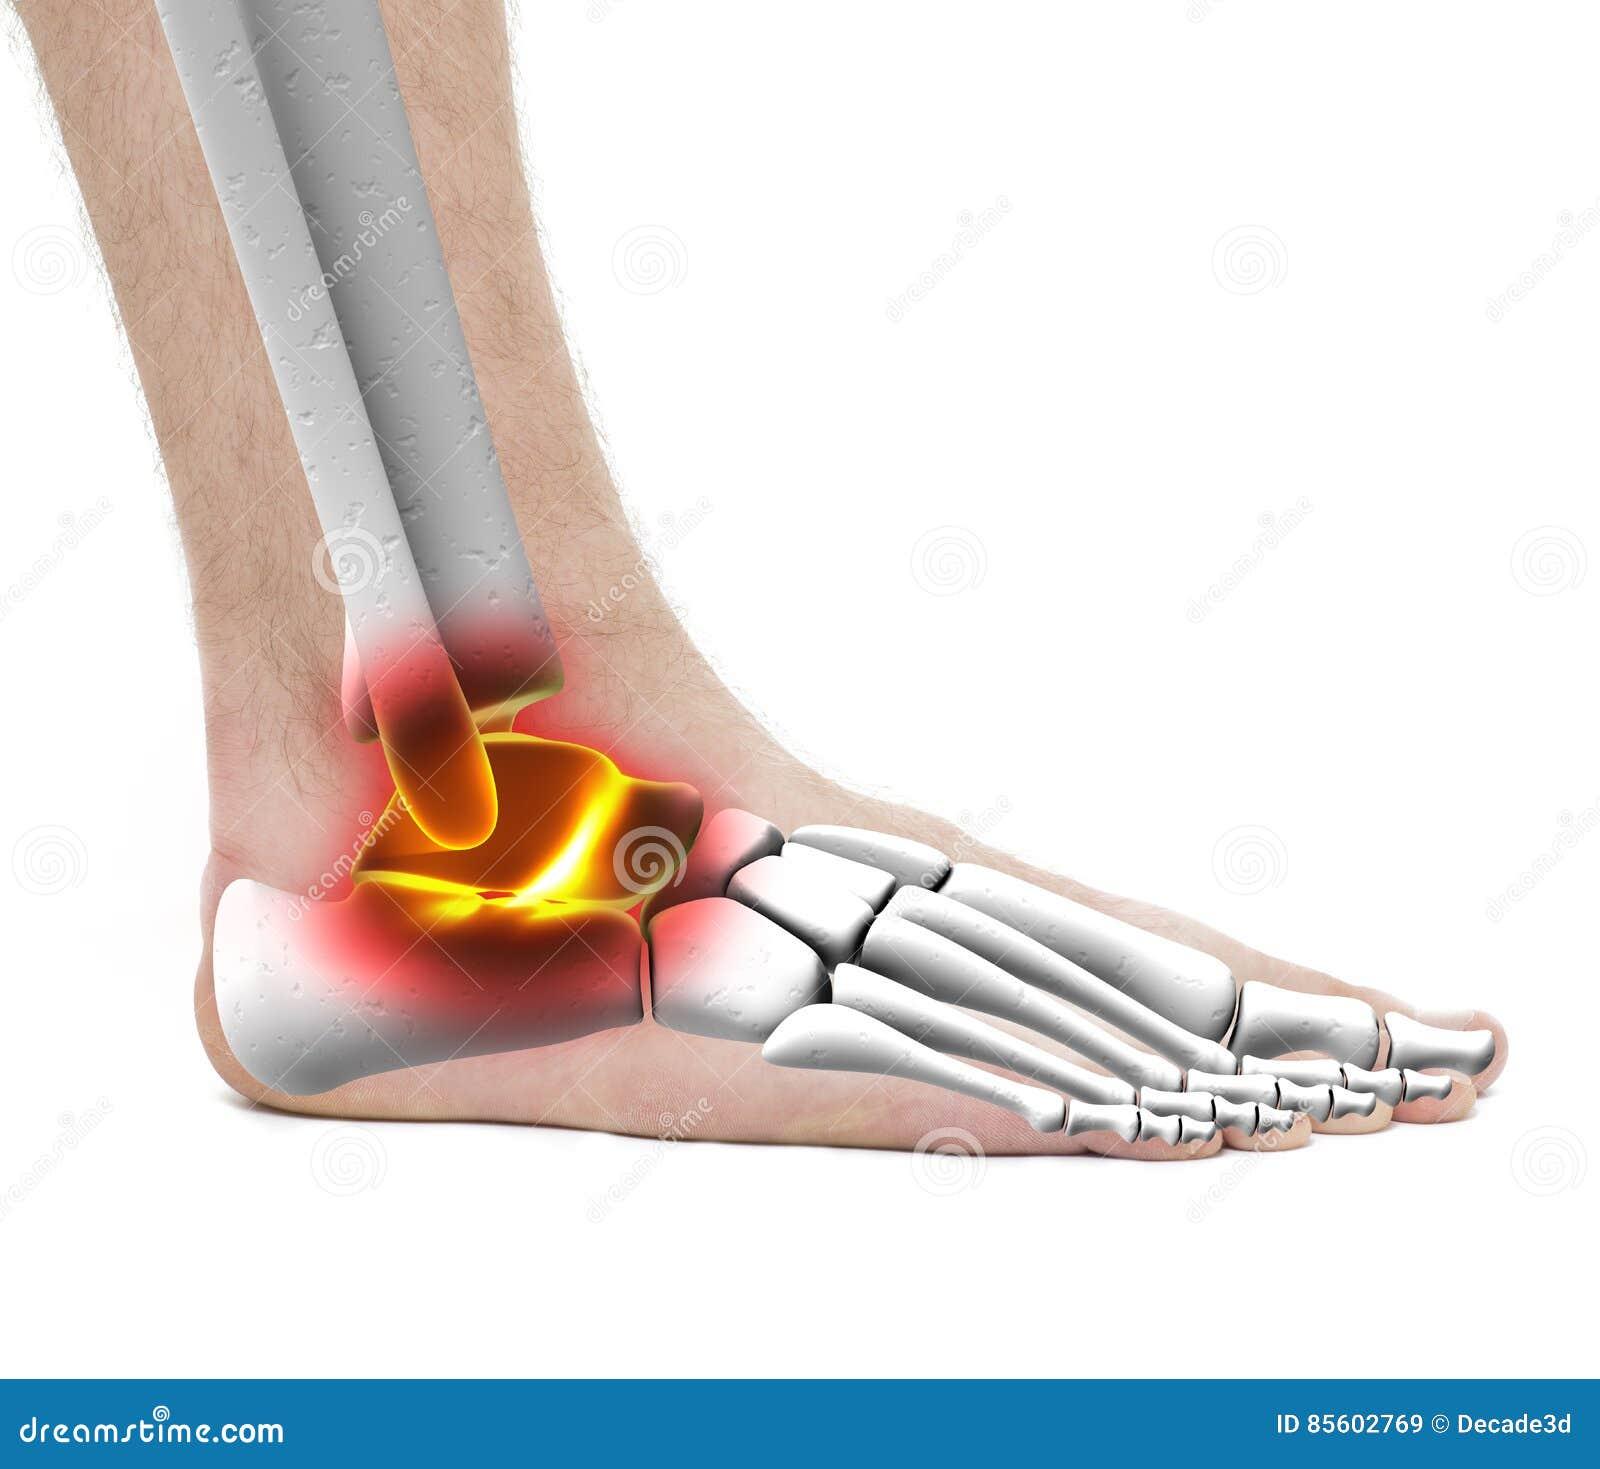 Ankle Pain Injury Anatomy Male Studio Photo Isolated On Whit